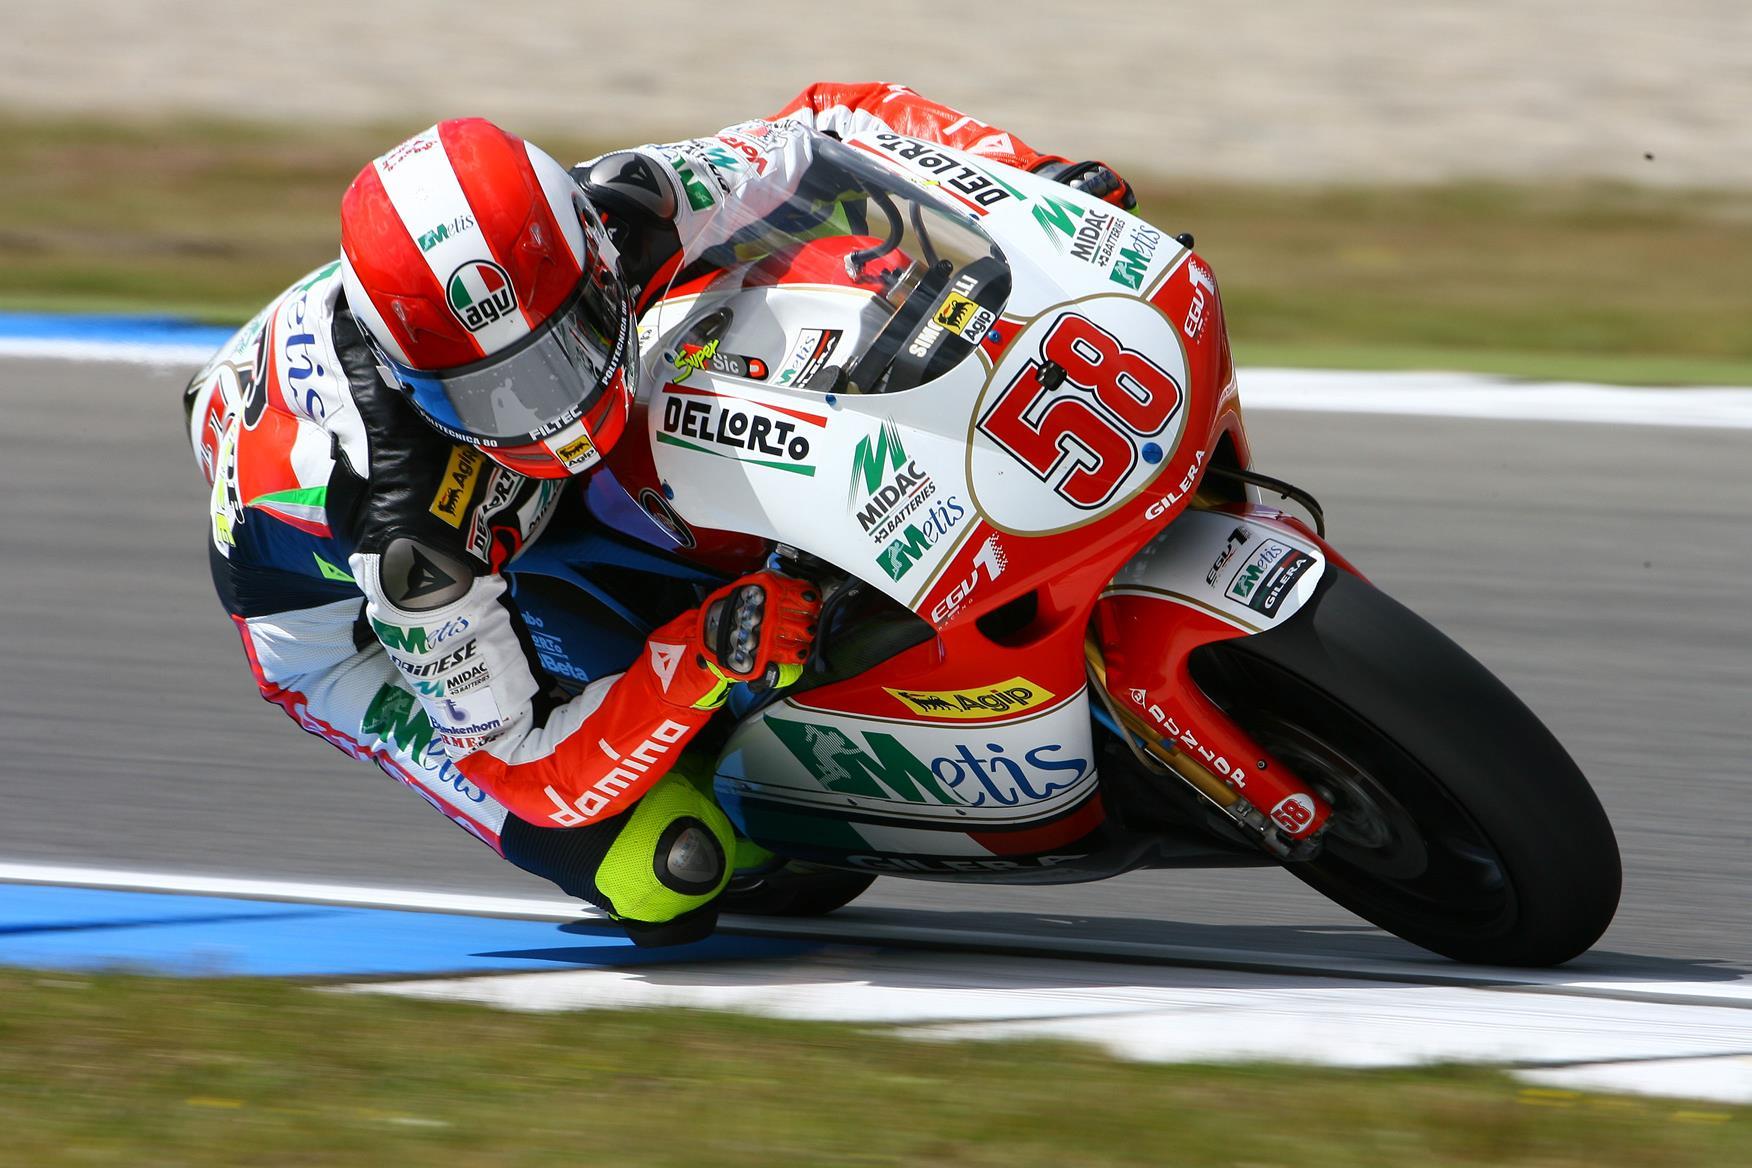 Phillip Island MotoGP: Marco Simoncelli smashes 250GP lap record | MCN